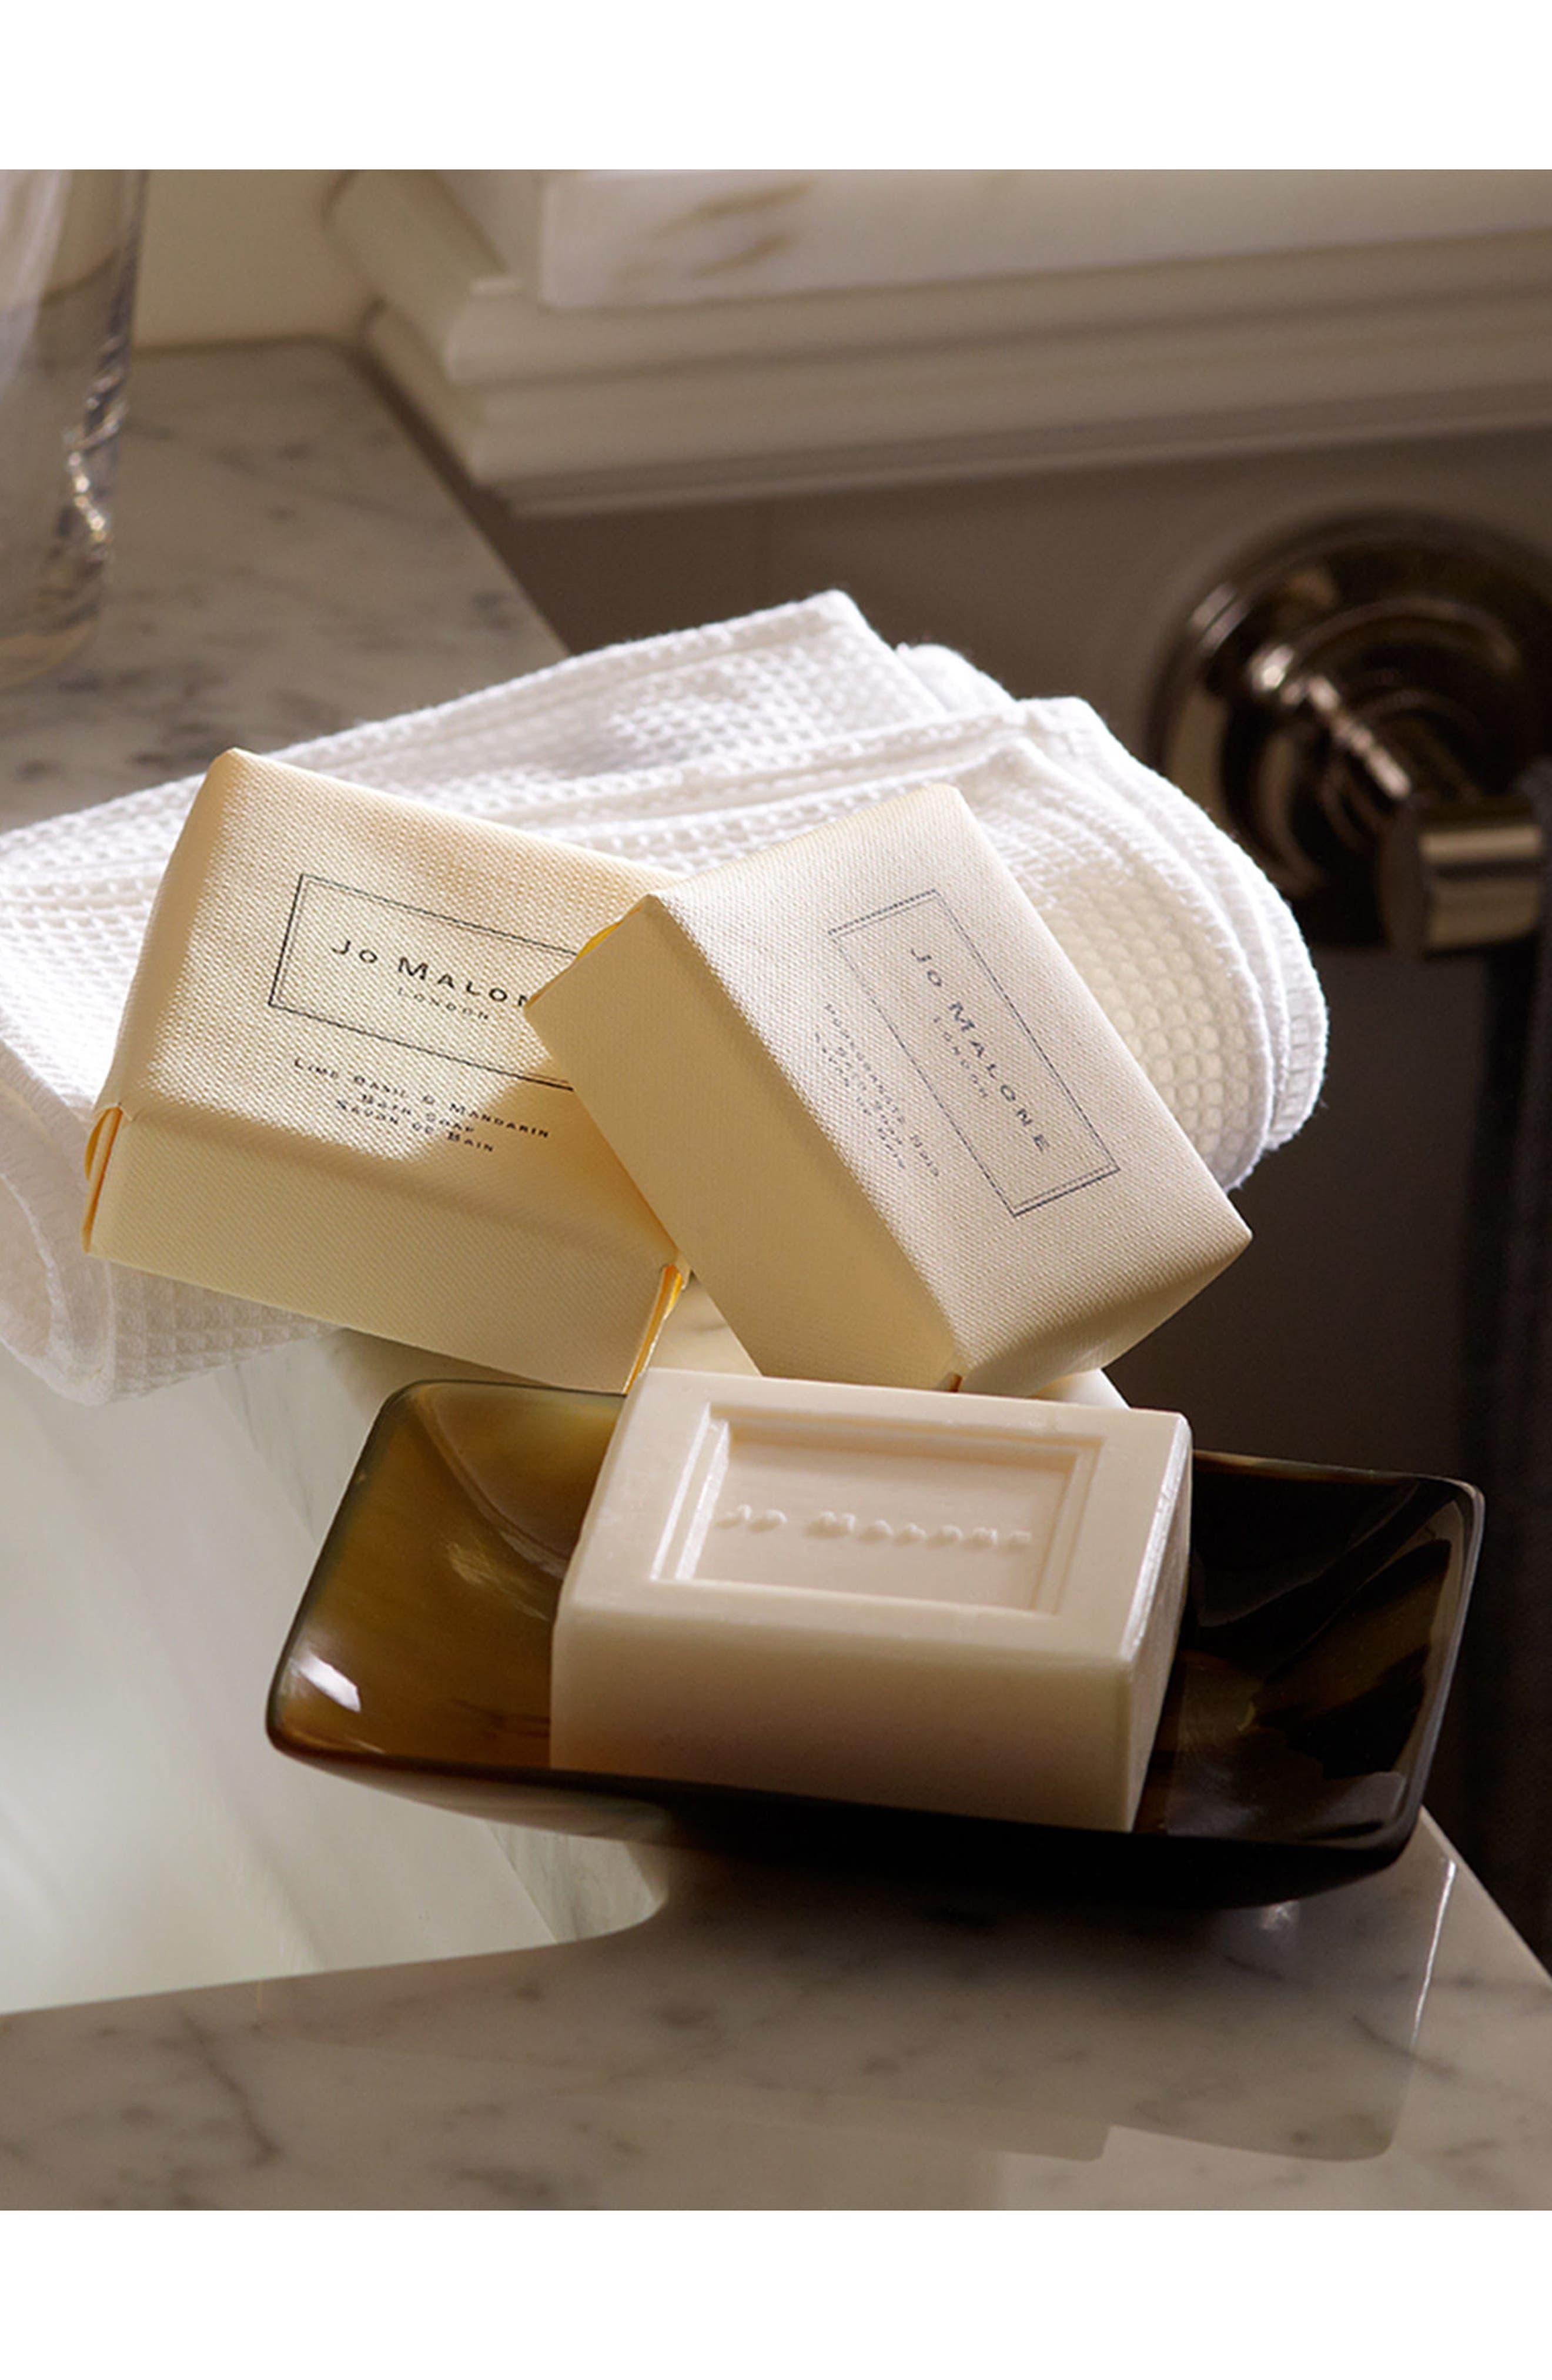 Lime Basil & Mandarin Bath Soap,                             Alternate thumbnail 3, color,                             NO COLOR